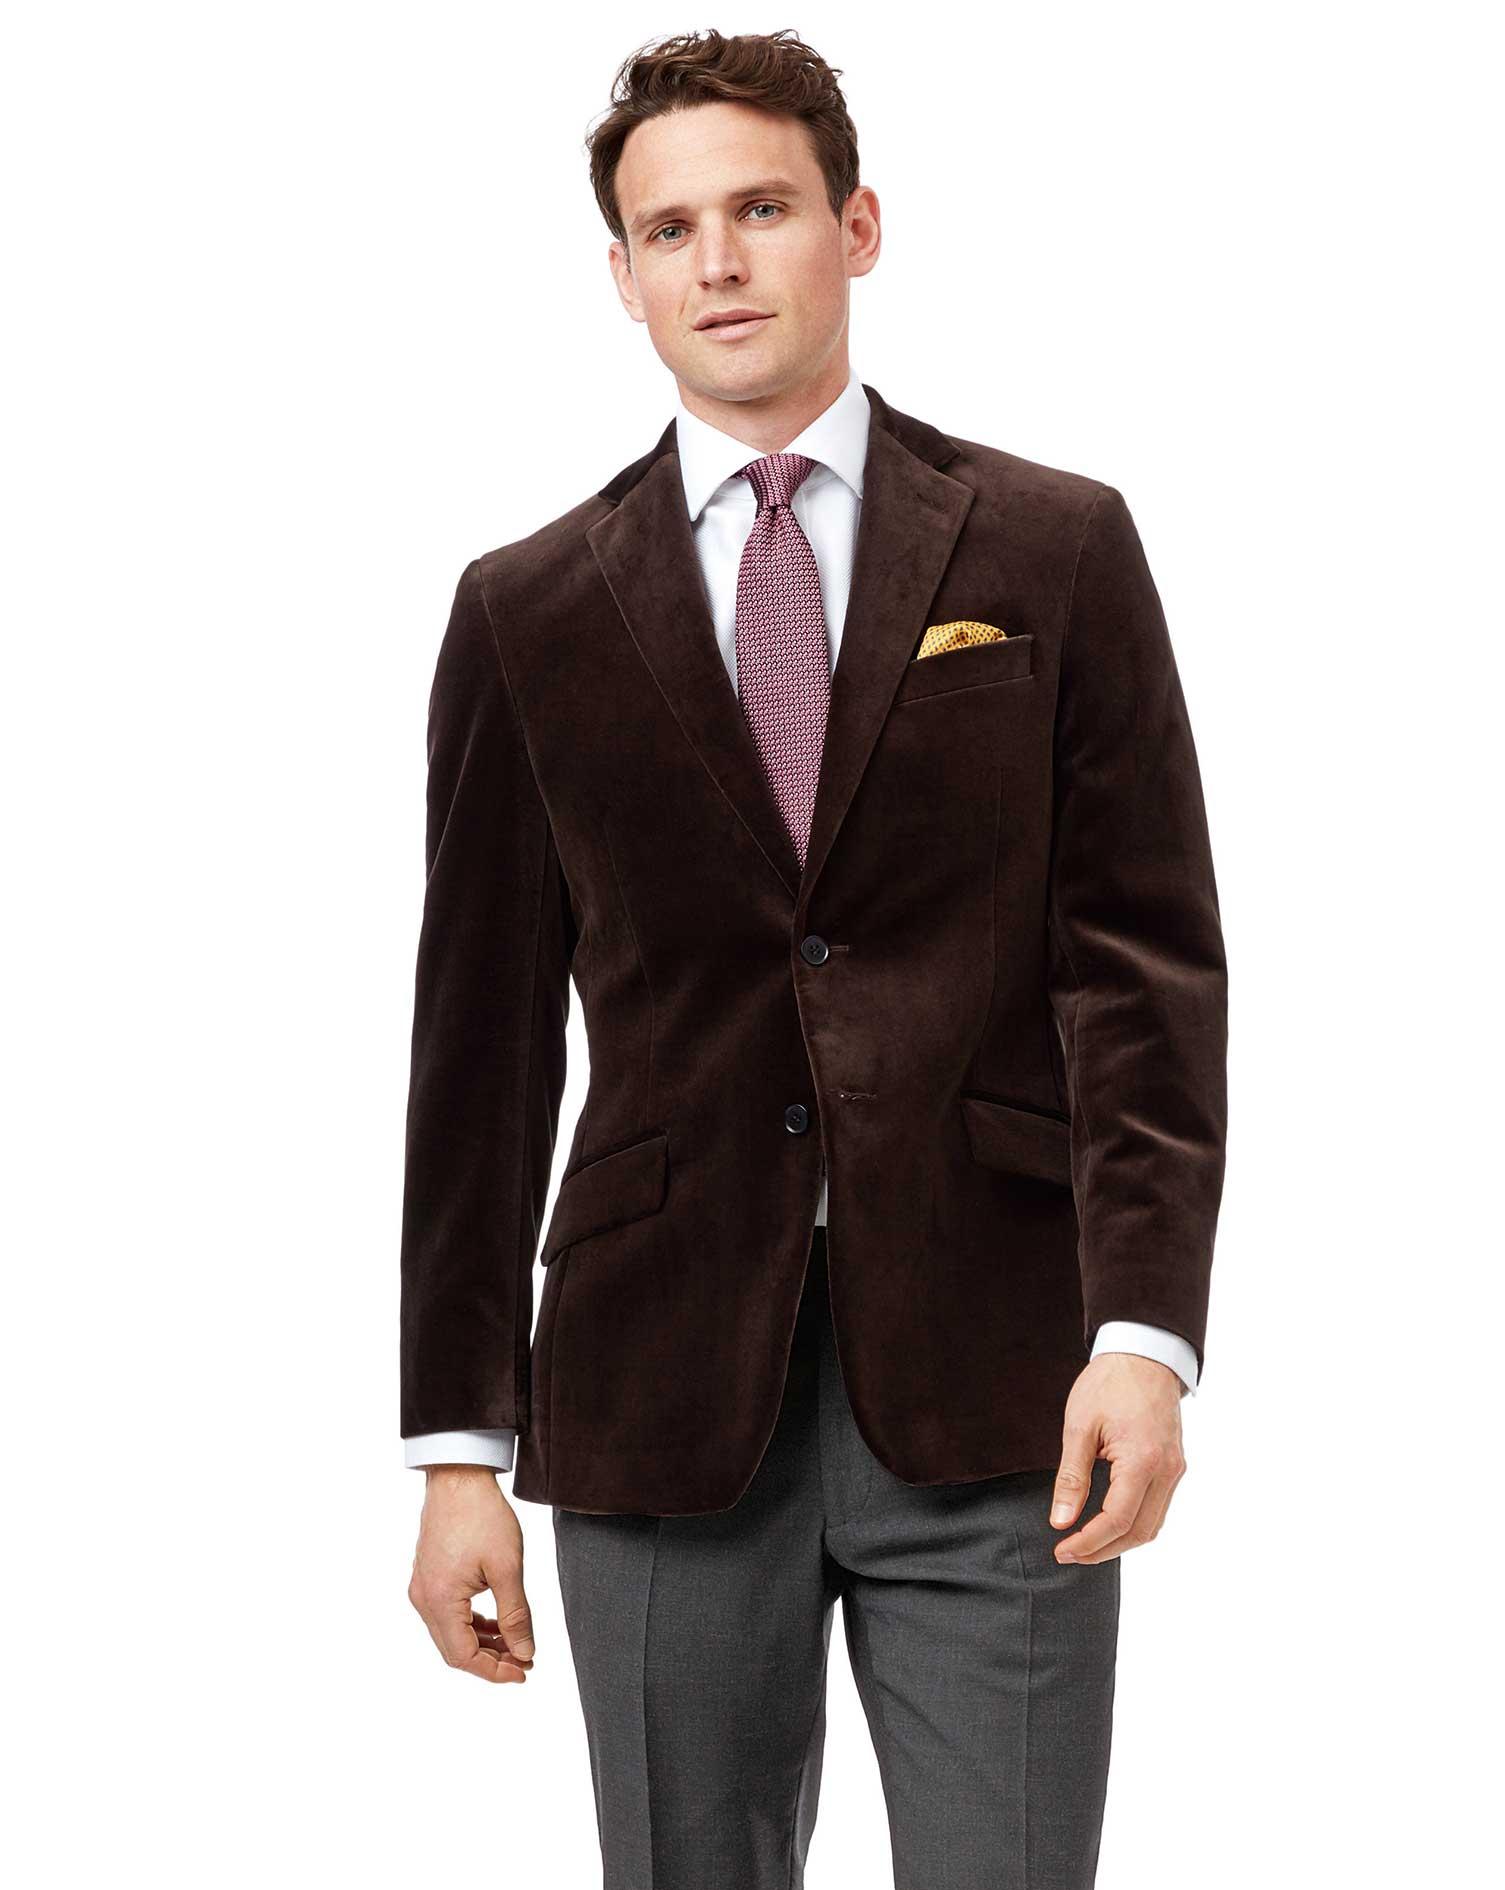 Cotton Slim Fit Brown Velvet Jacket